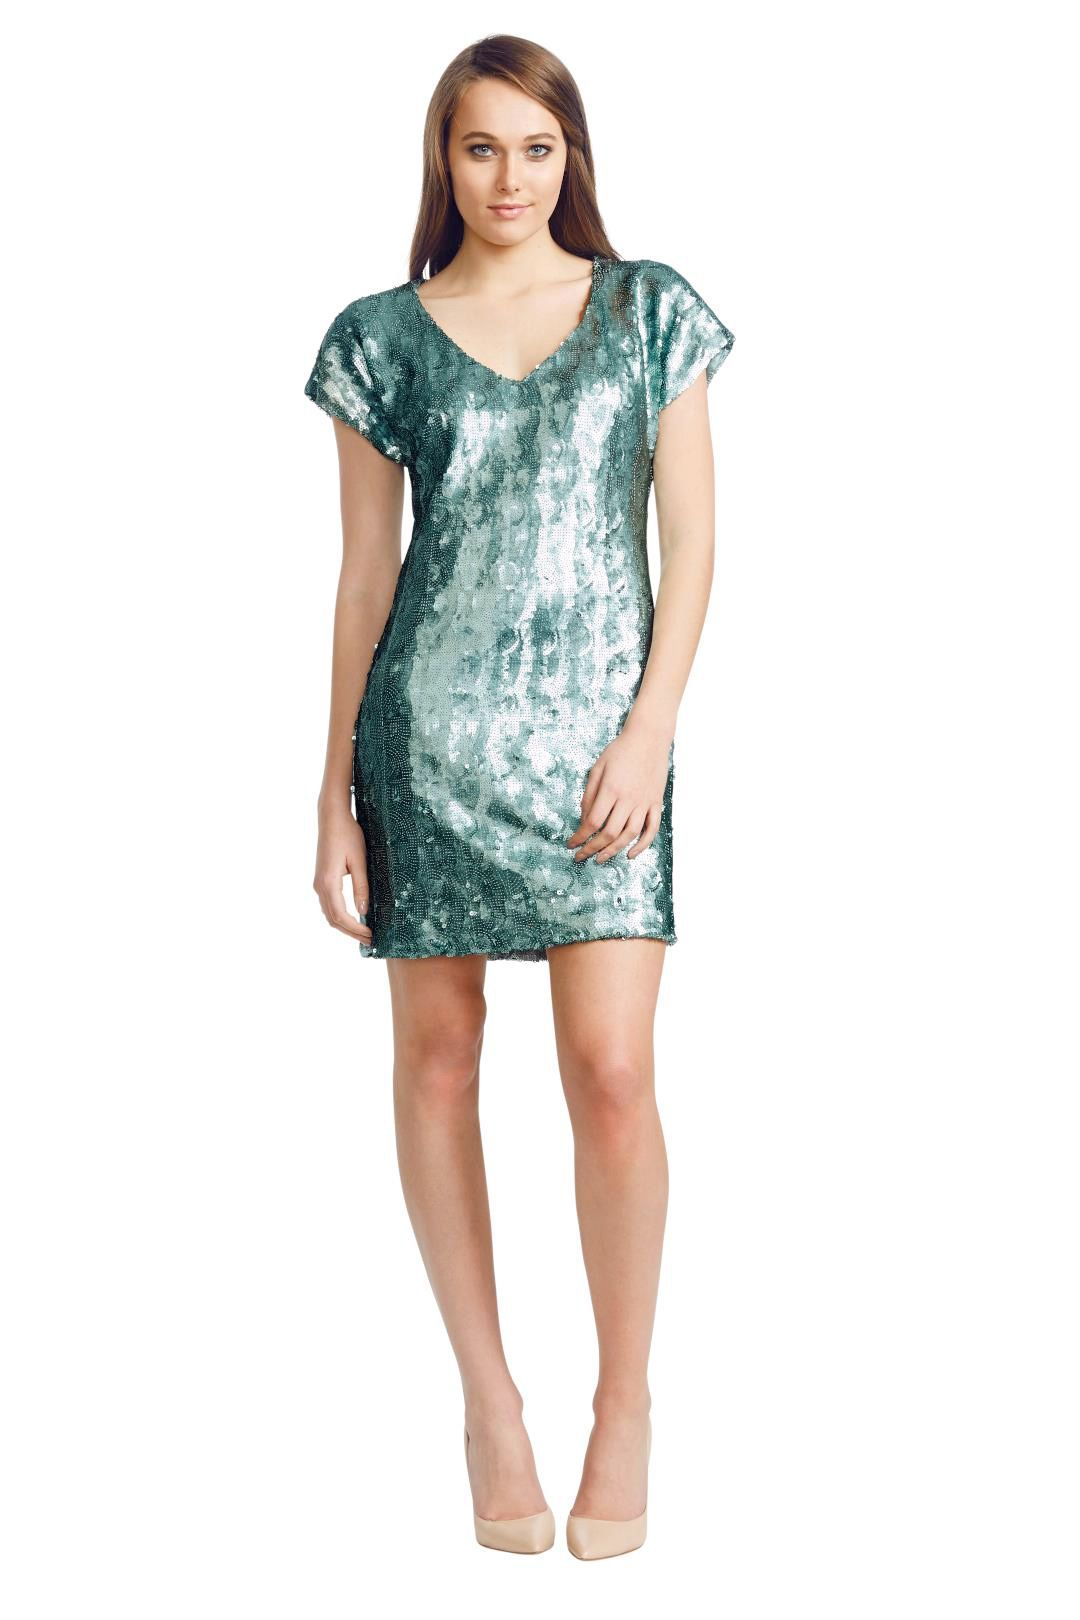 Wayne Cooper - Mermaid Shift Dress - Green - Front